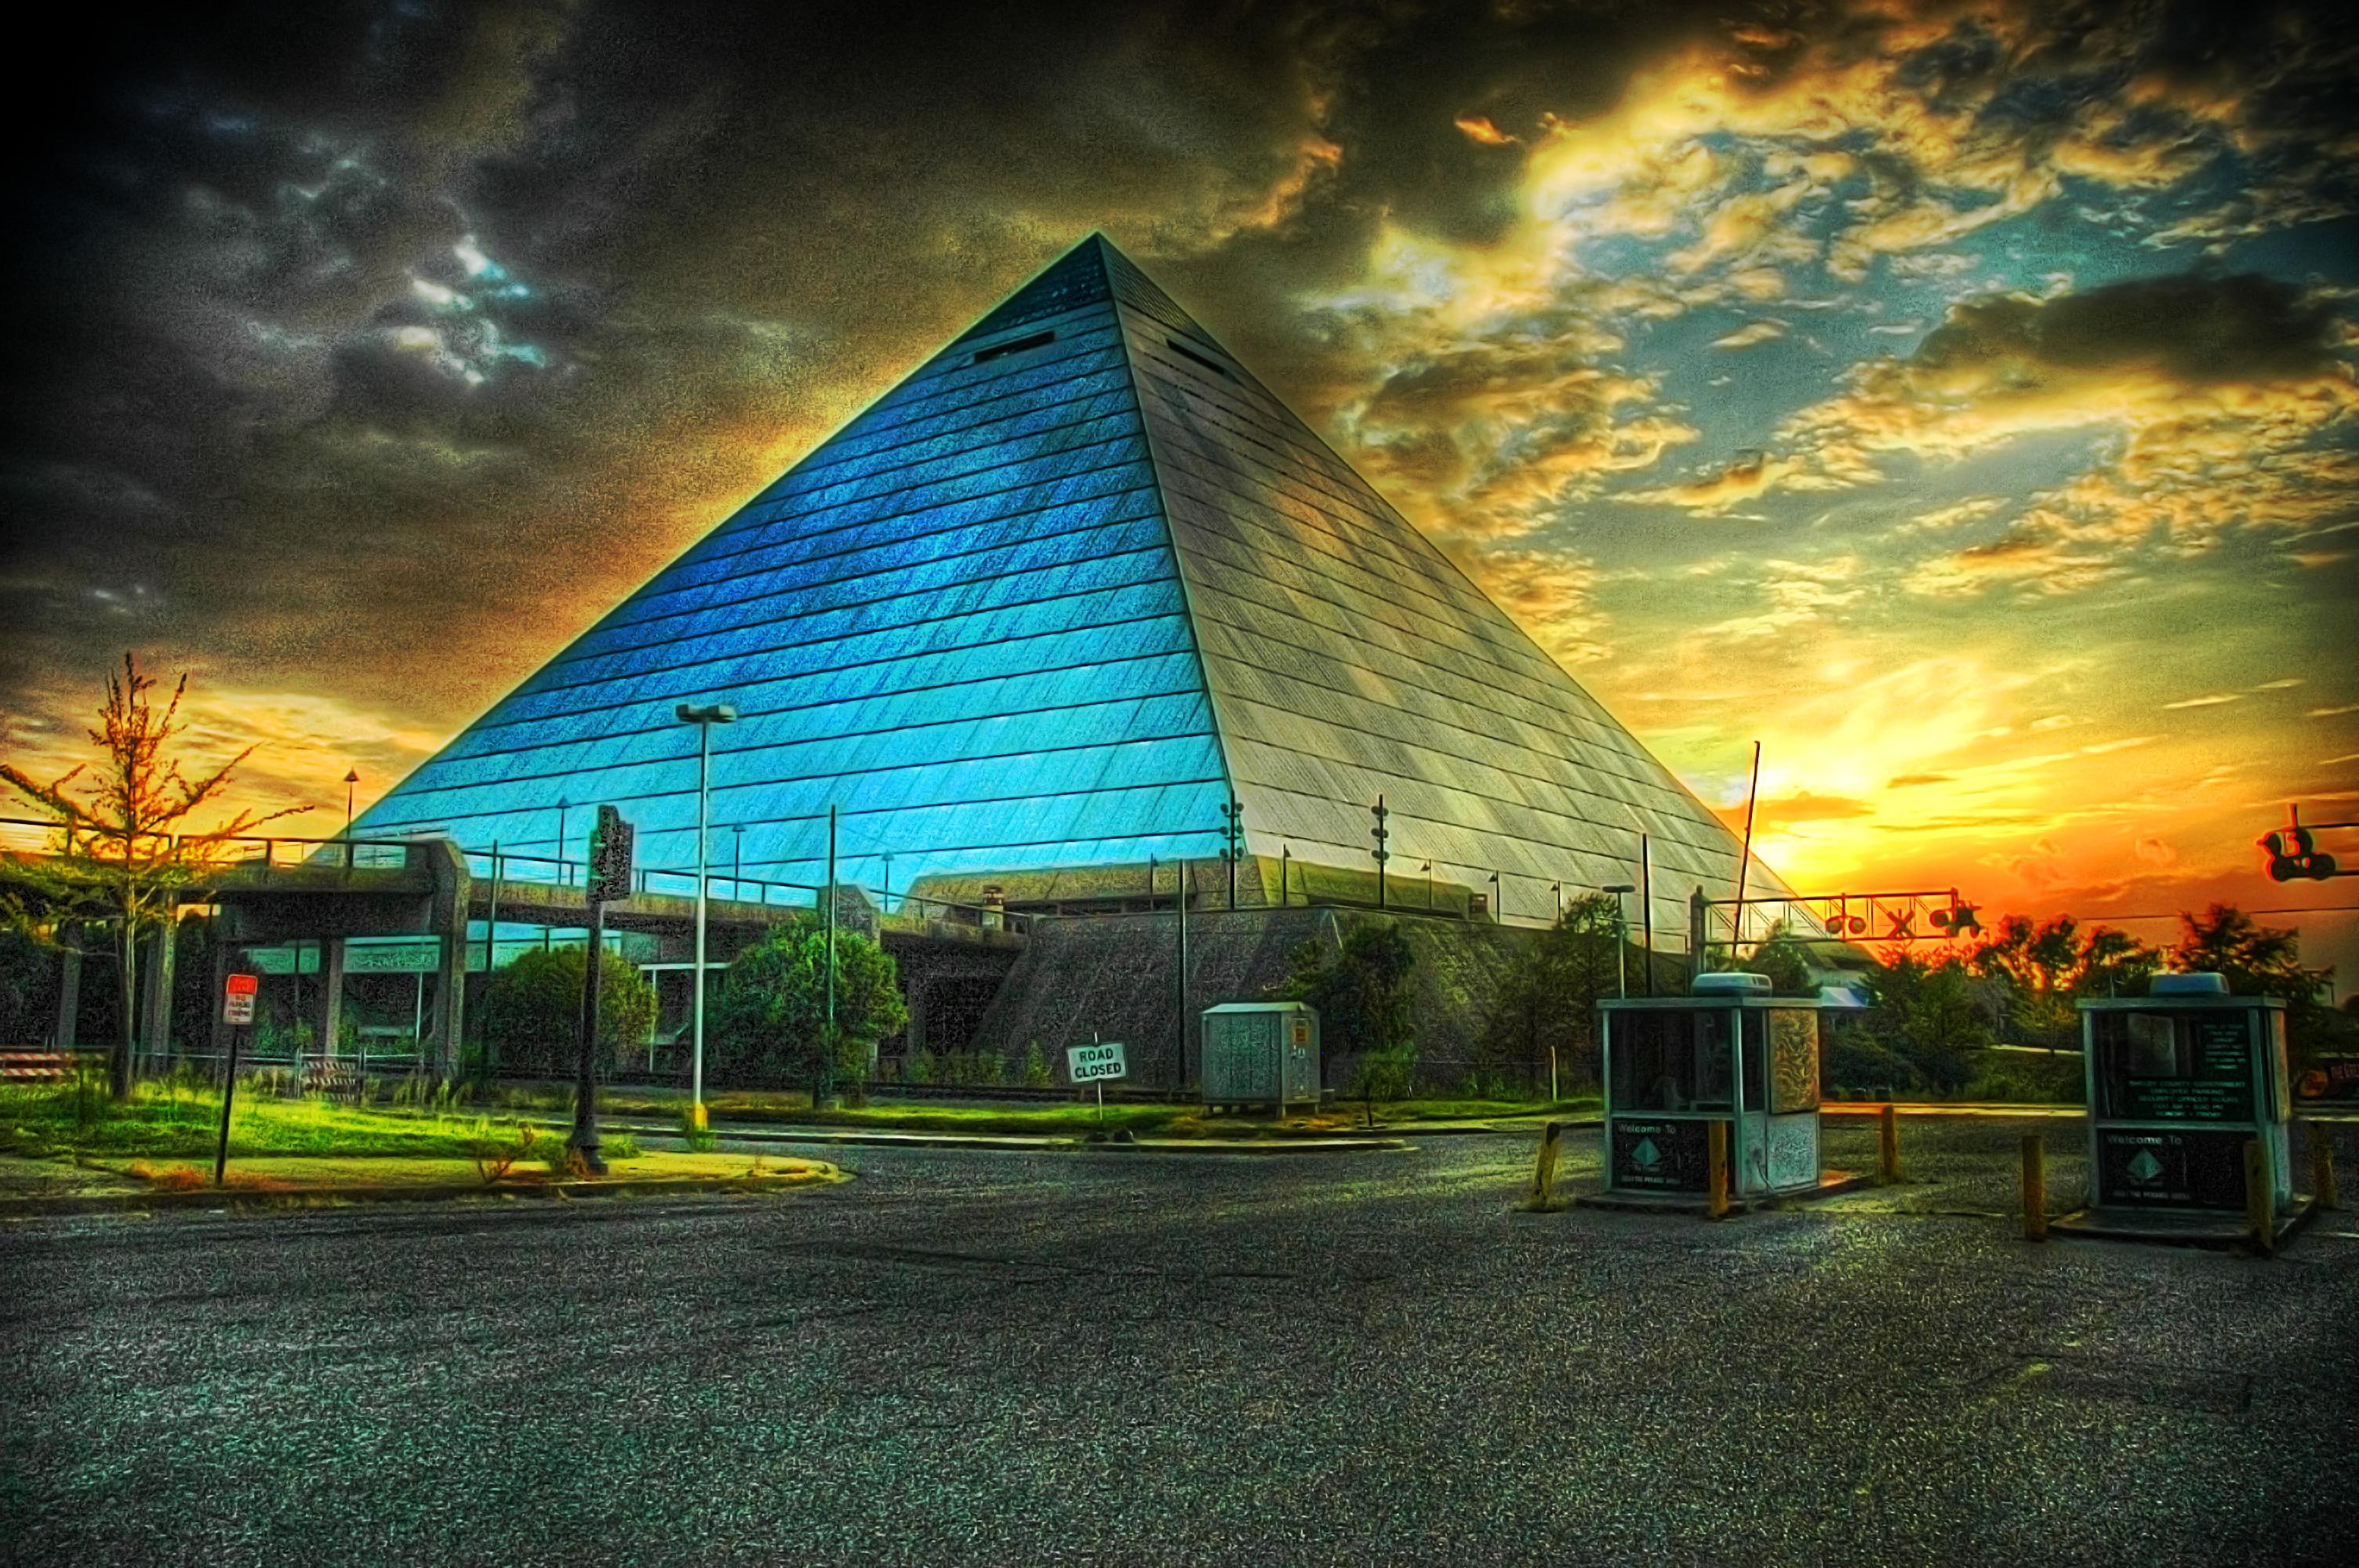 Pyramid Arena Memphis TN | Flickr - Photo Sharing!